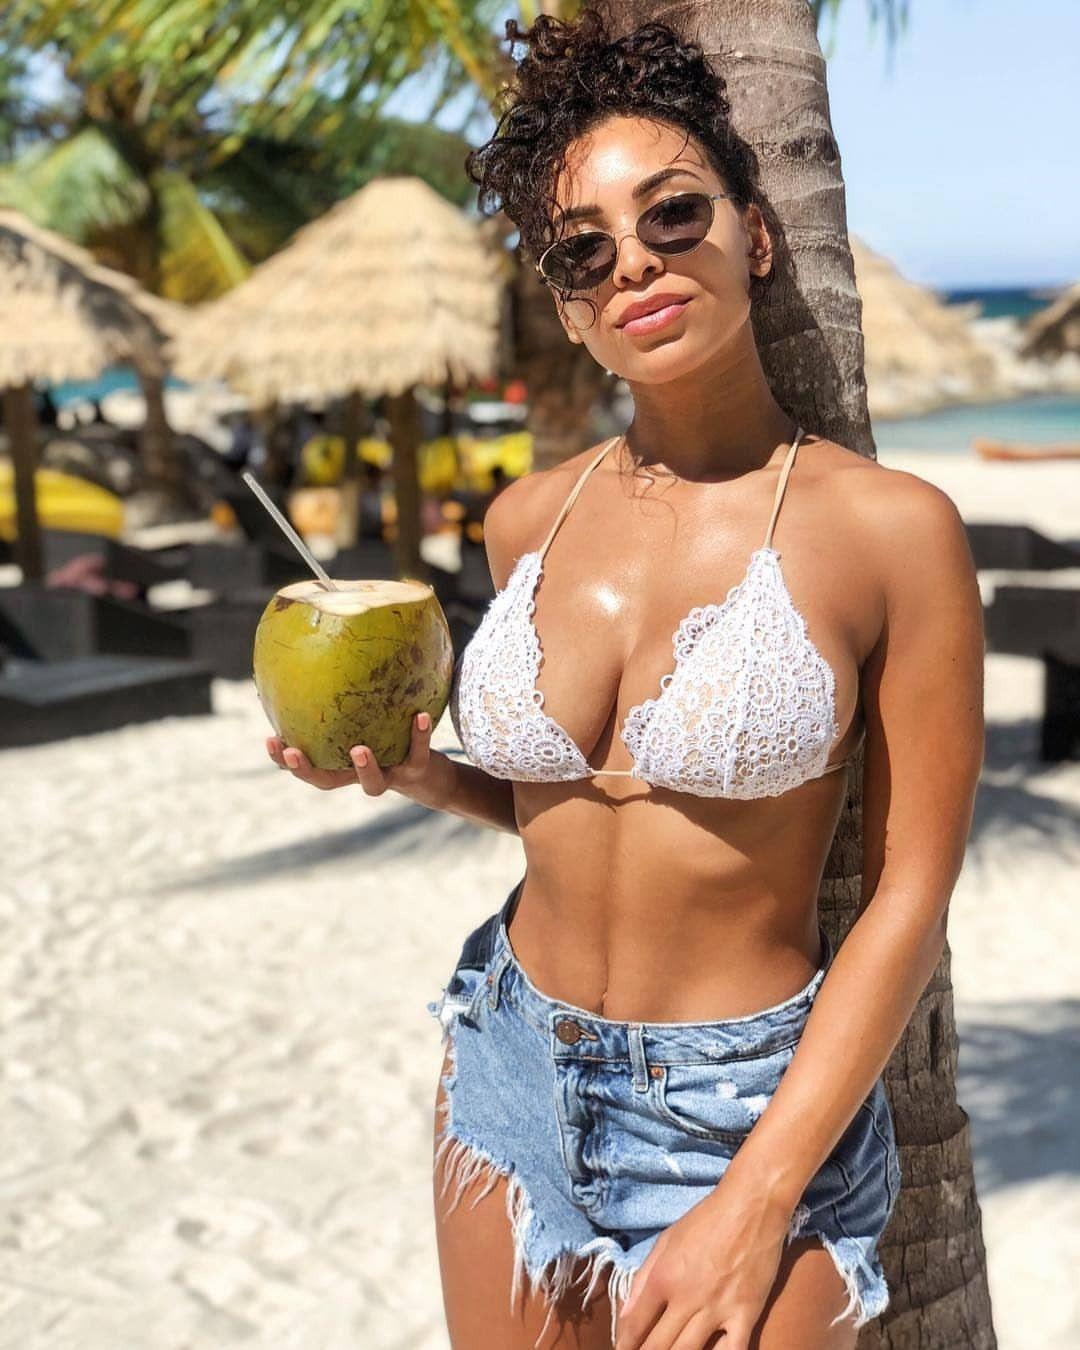 Bikini Katerina Rubinovich nude (61 photos), Topless, Paparazzi, Selfie, braless 2019